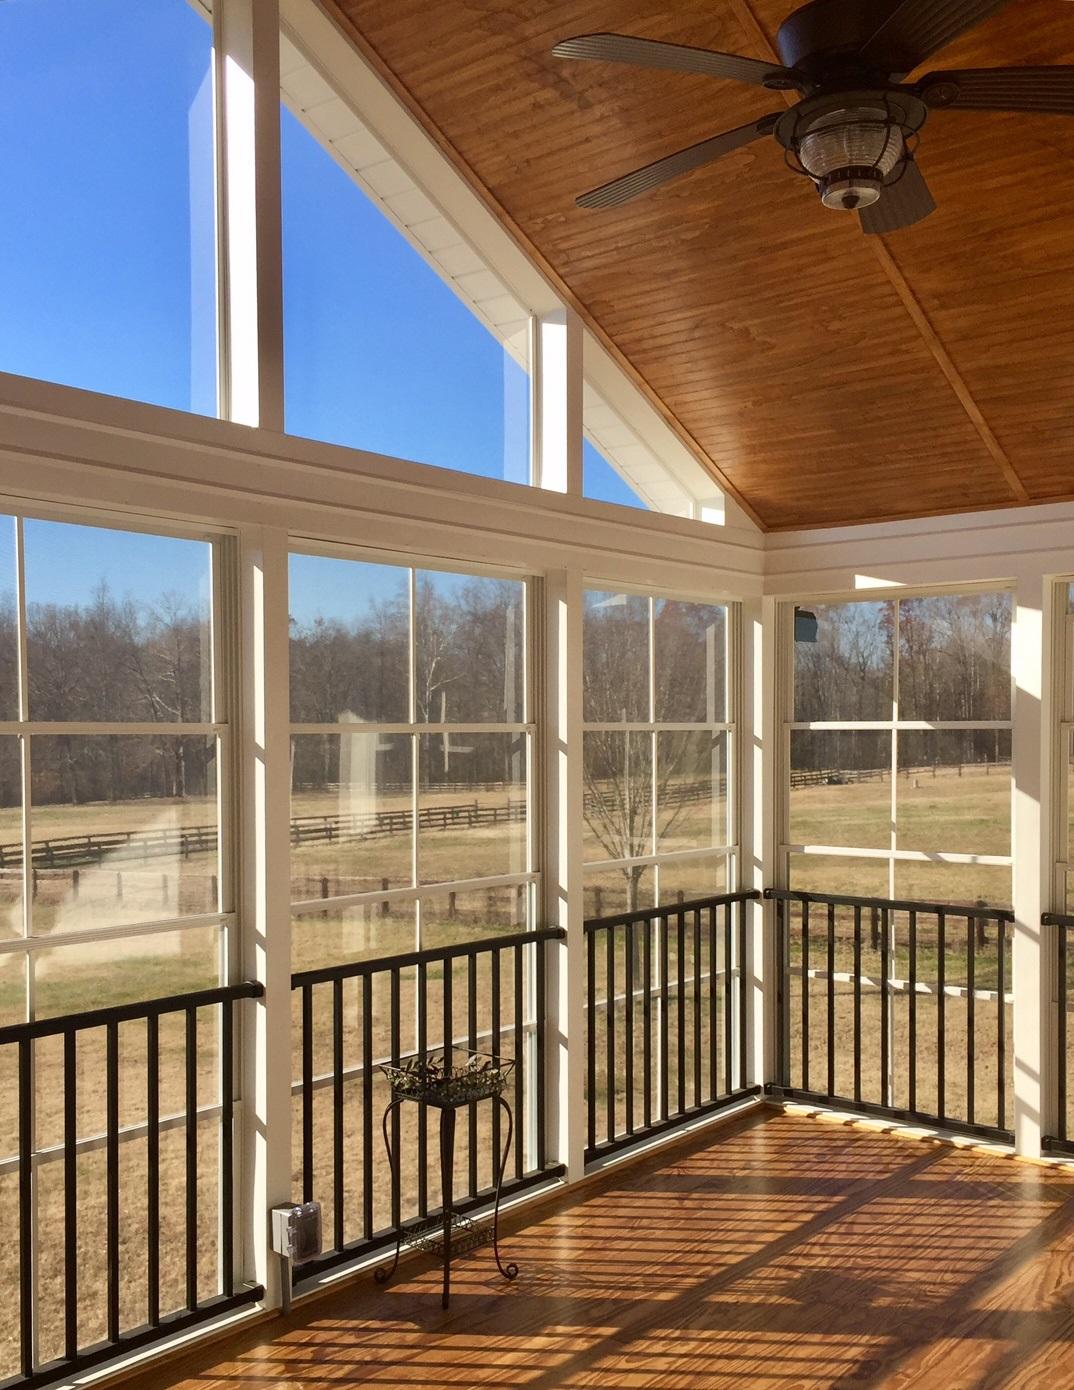 Eze-Breeze-windows-are-a-breeze-to-operate